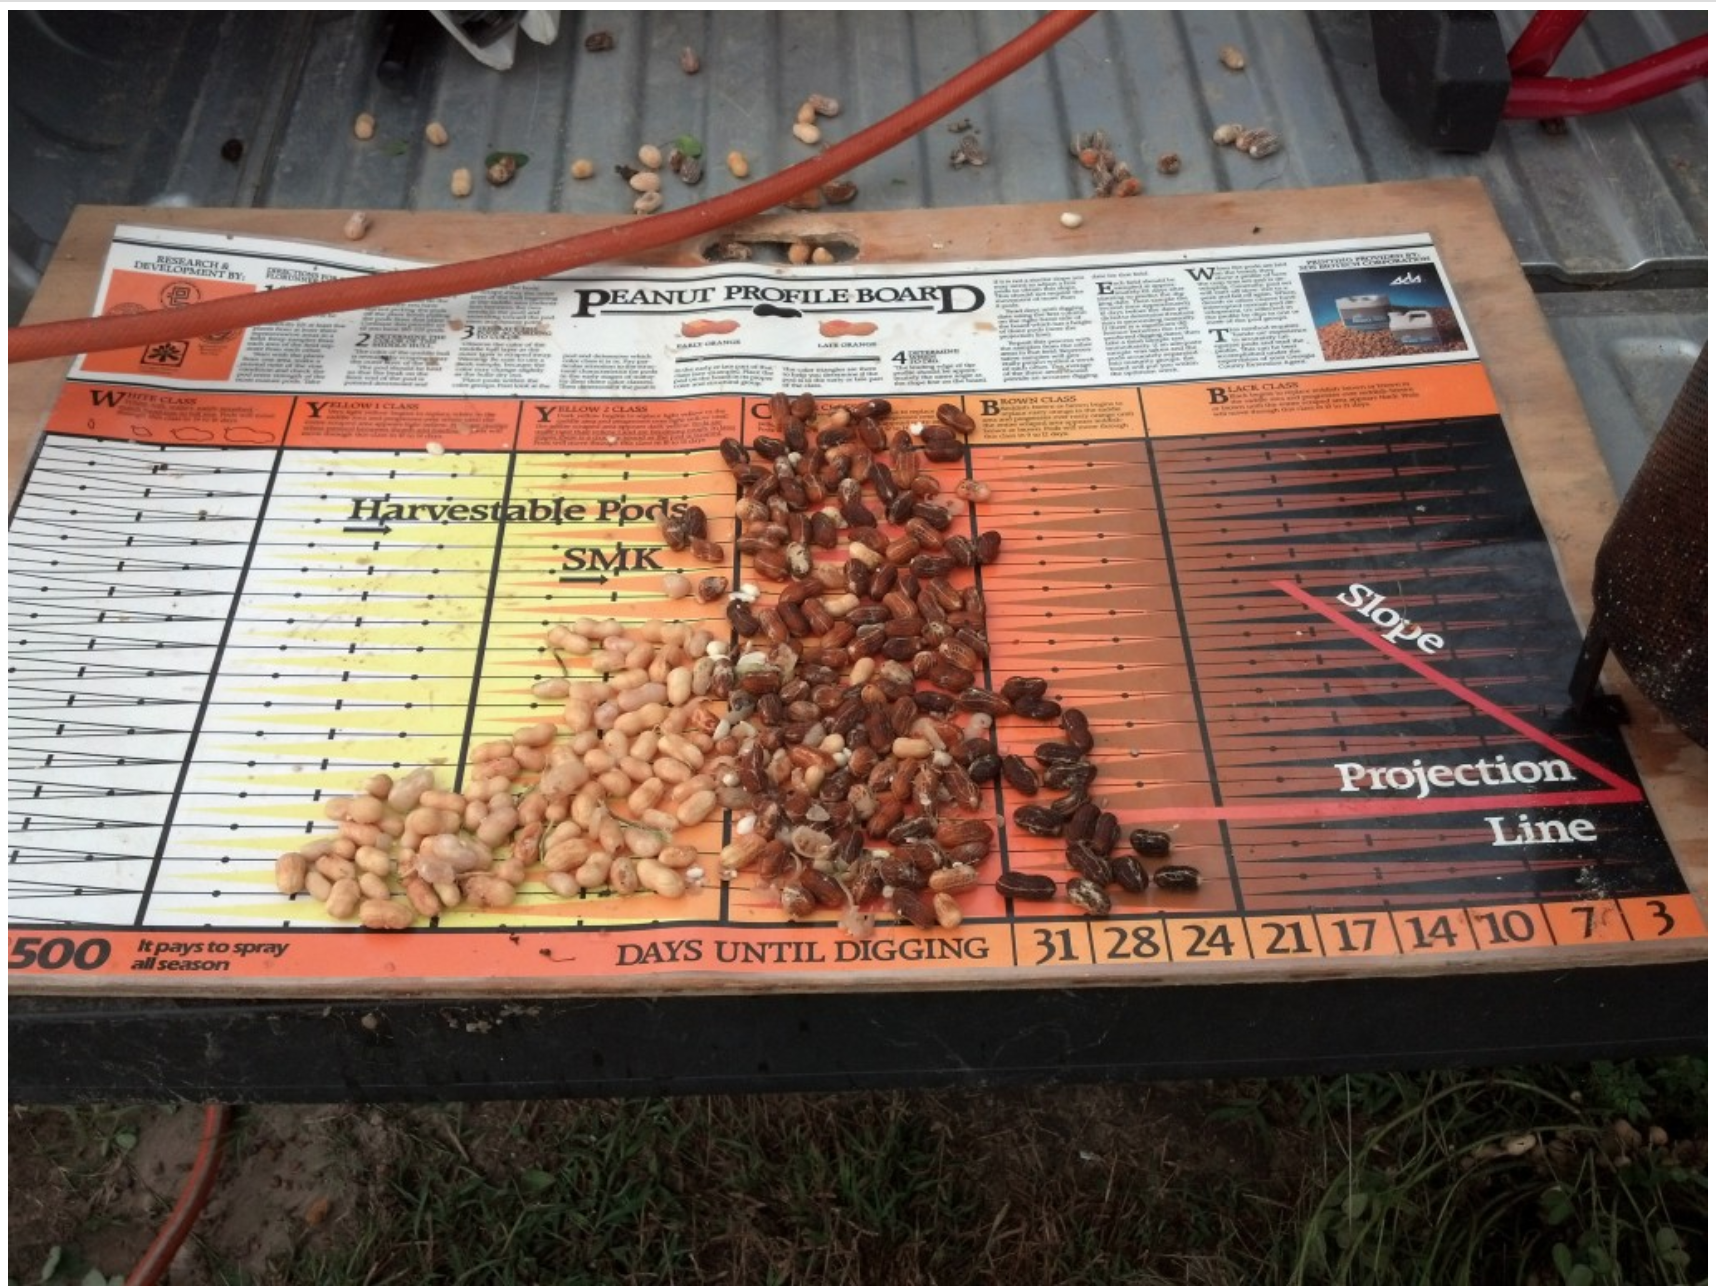 Peanut Profile Board. Credit: UGA Extension.